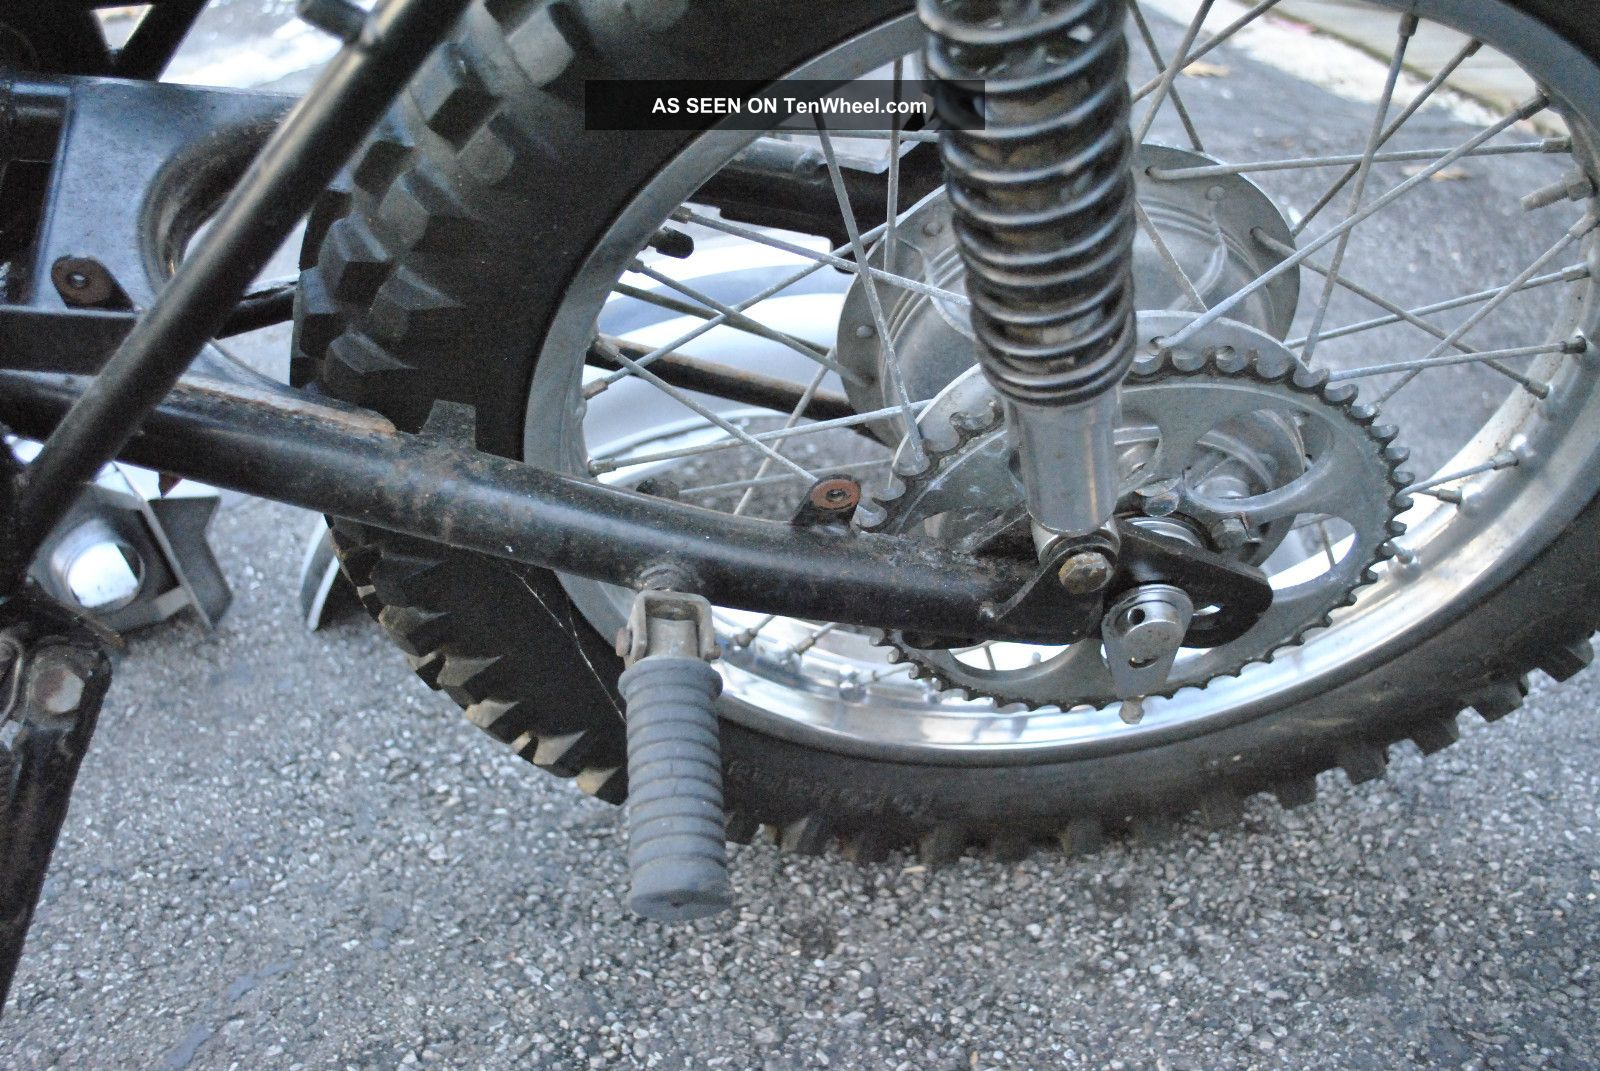 Vintage 1971 Yamaha Dt 1 F 250 Cc Enduro Motorcycle Dirt Bike Honda 50cc Motocross Mx